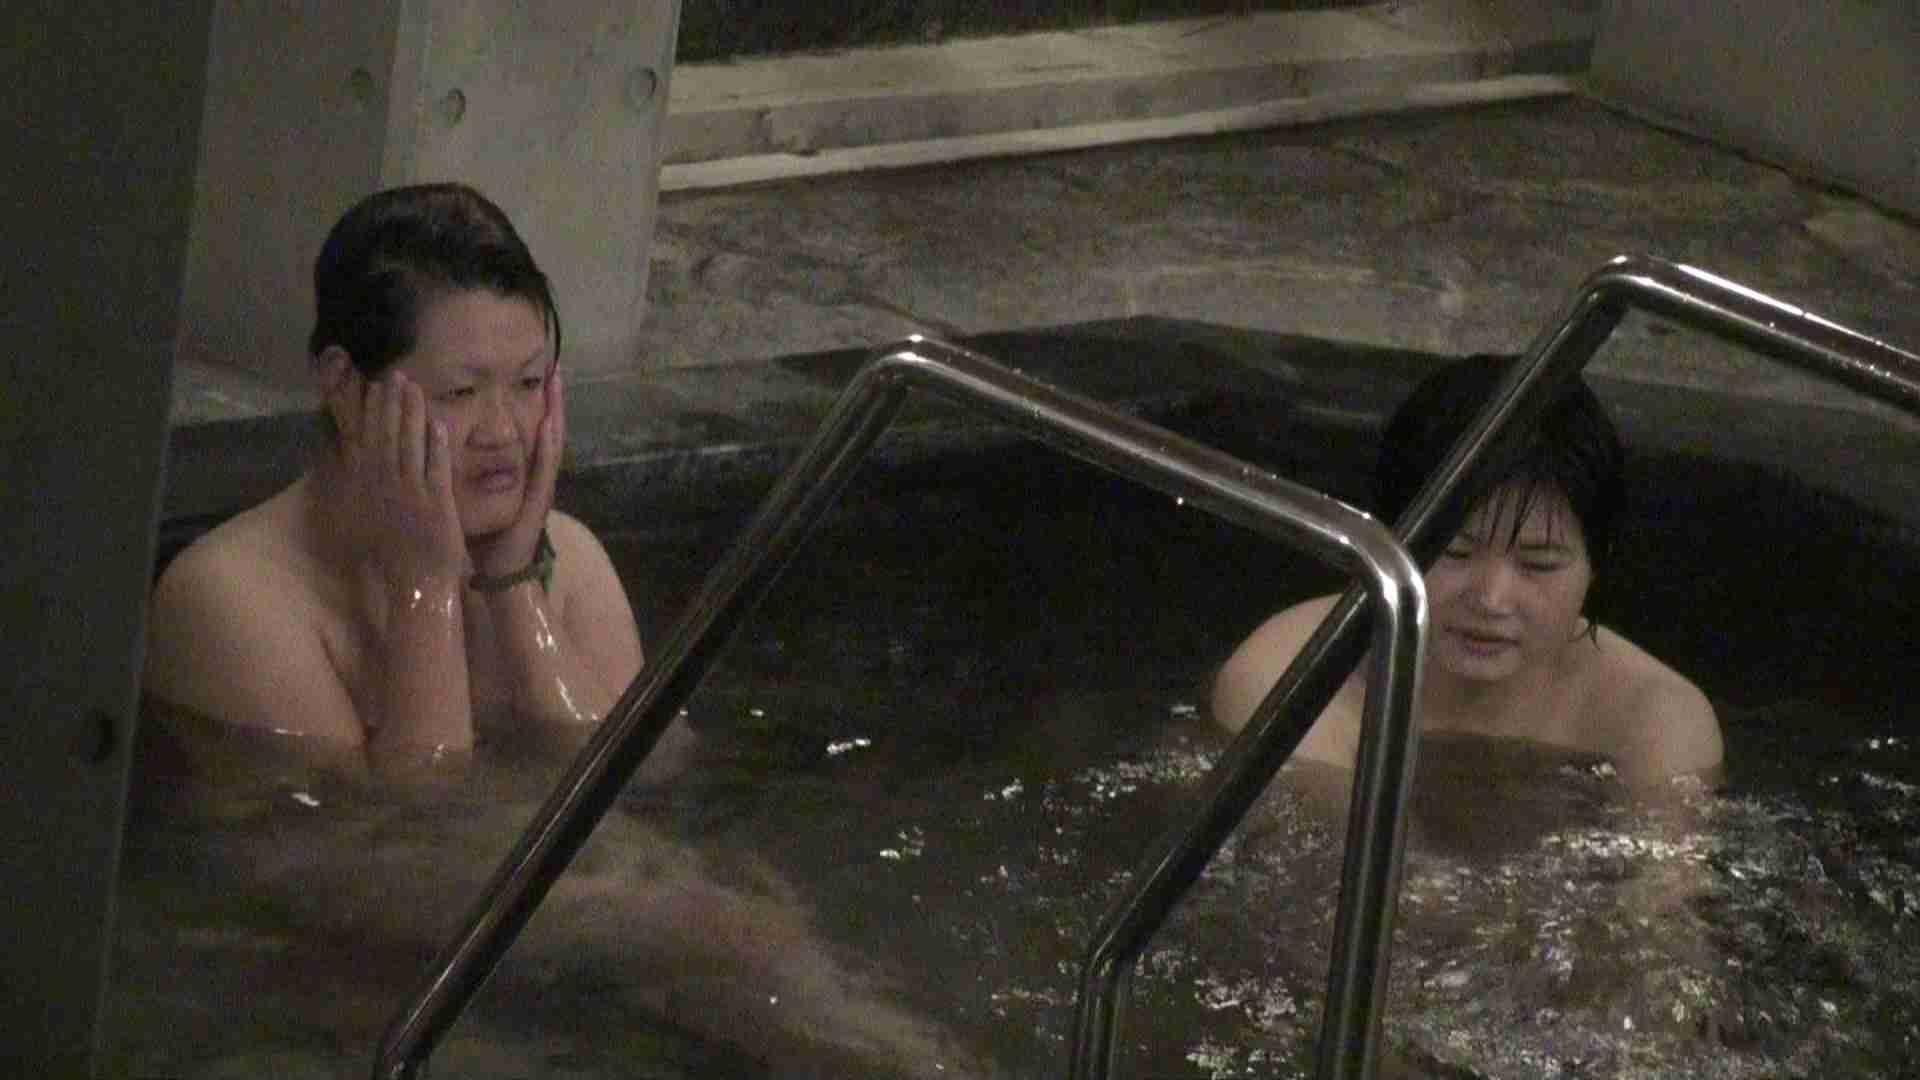 Aquaな露天風呂Vol.384 OLセックス | 盗撮  60画像 43